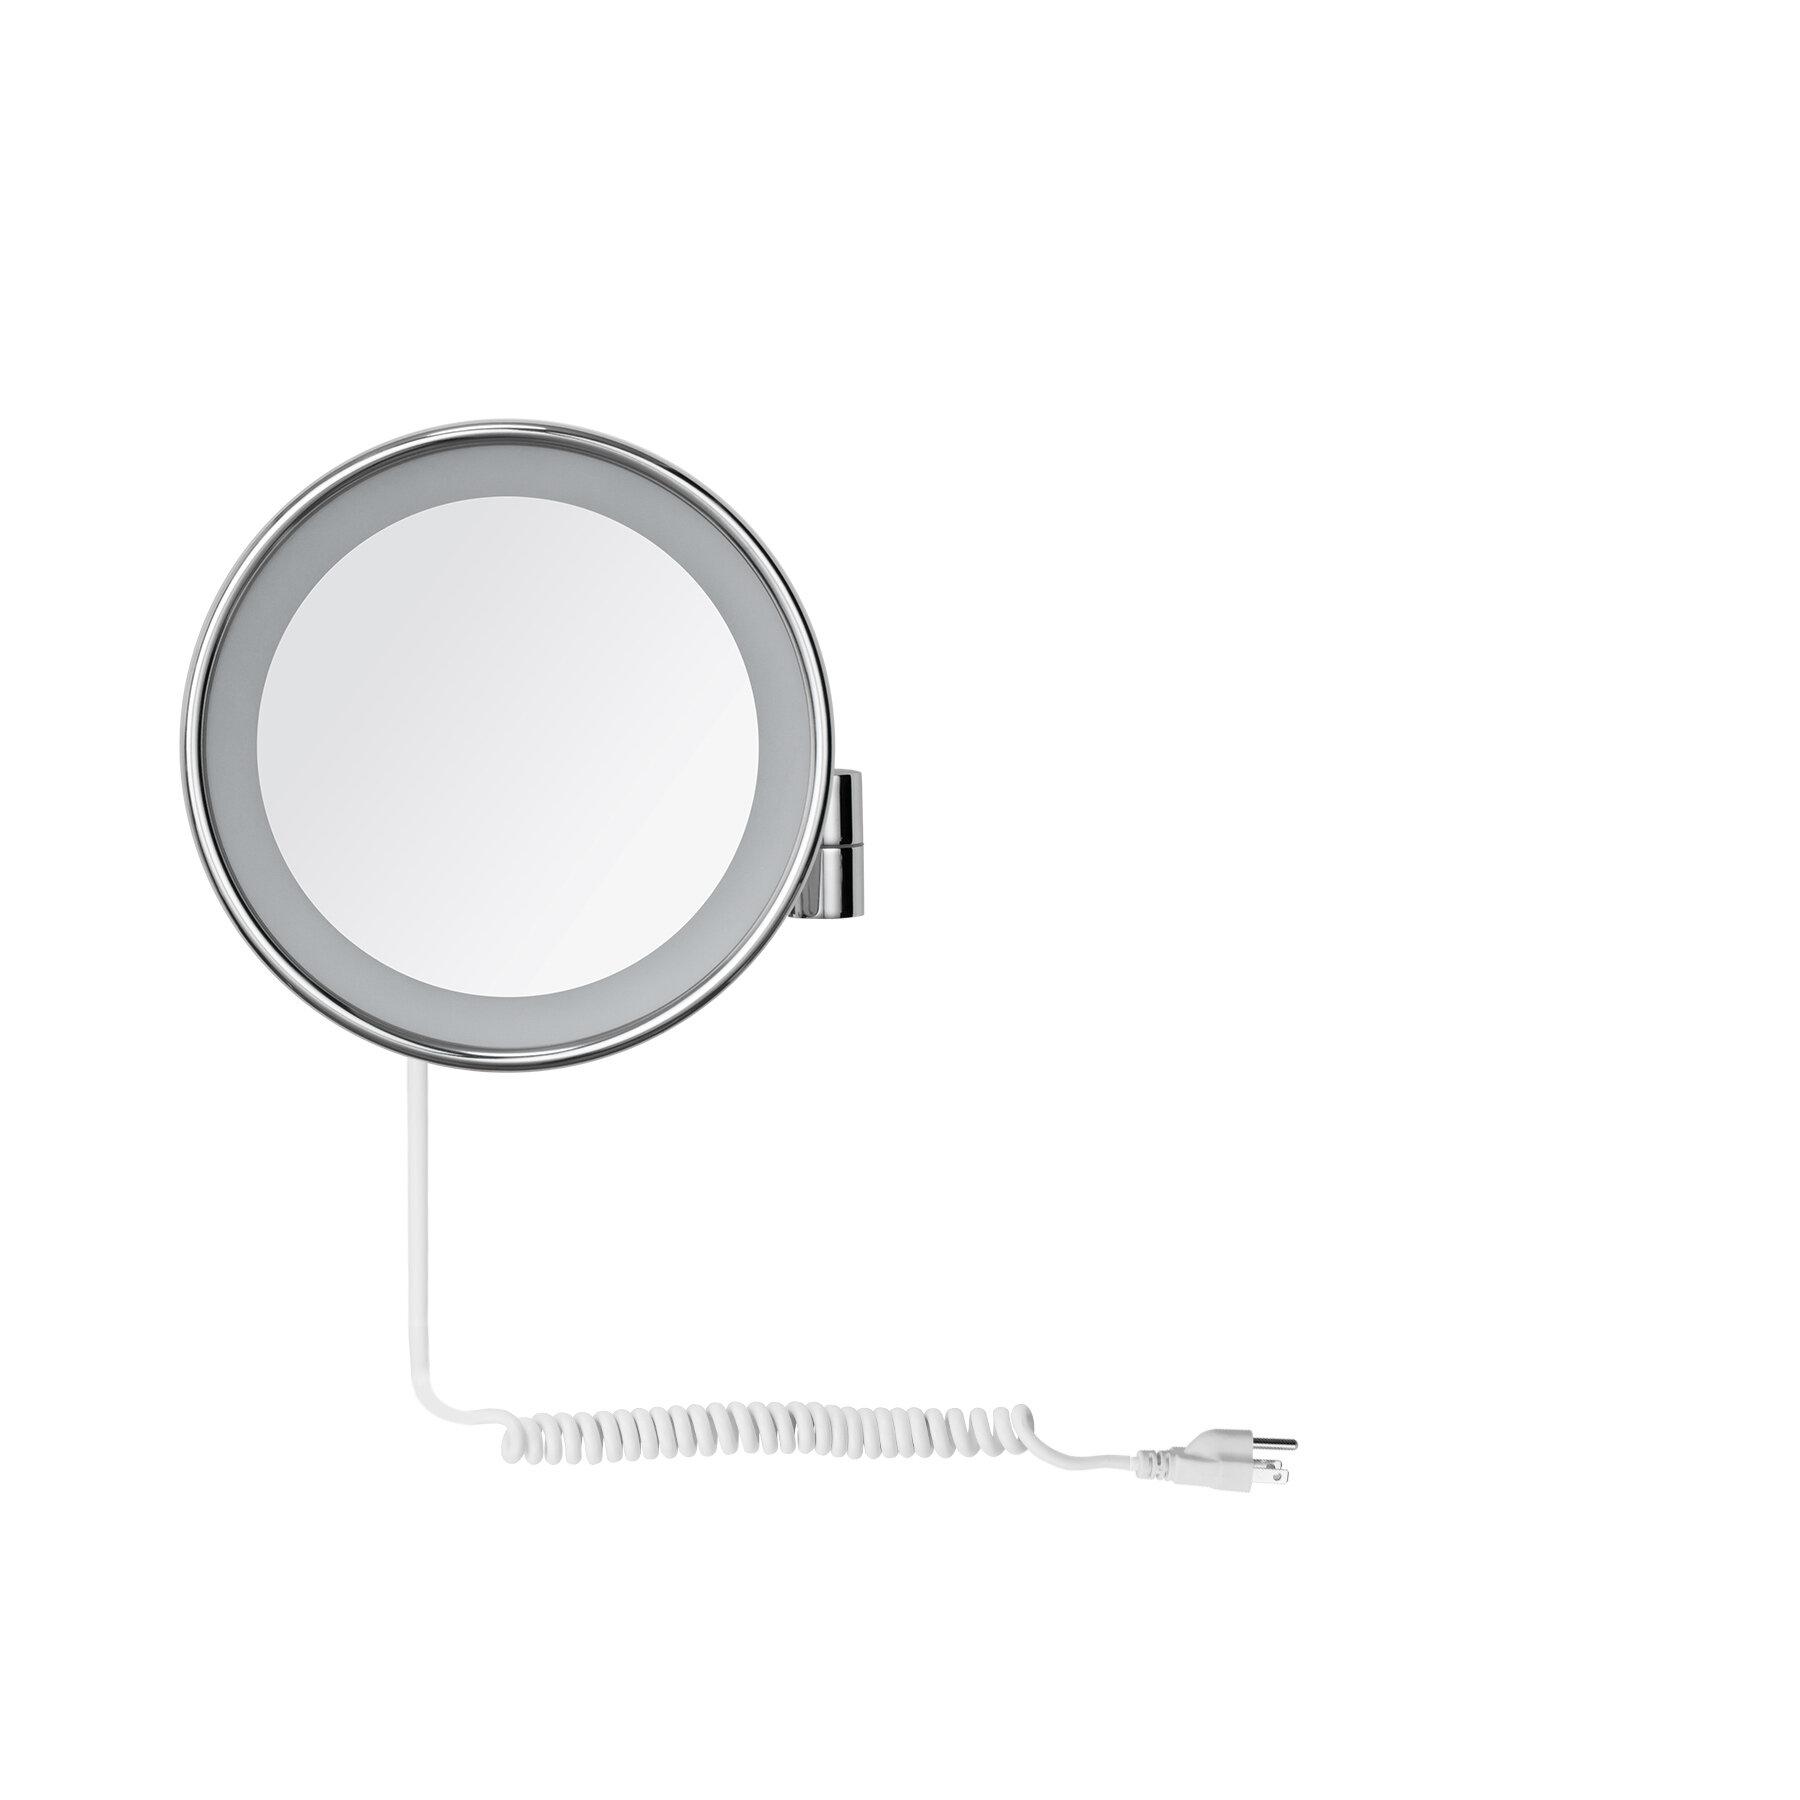 Charlton Home Driskell Bathroom Vanity Mirror Wayfair Jerdon Mounted Wiring Diagram